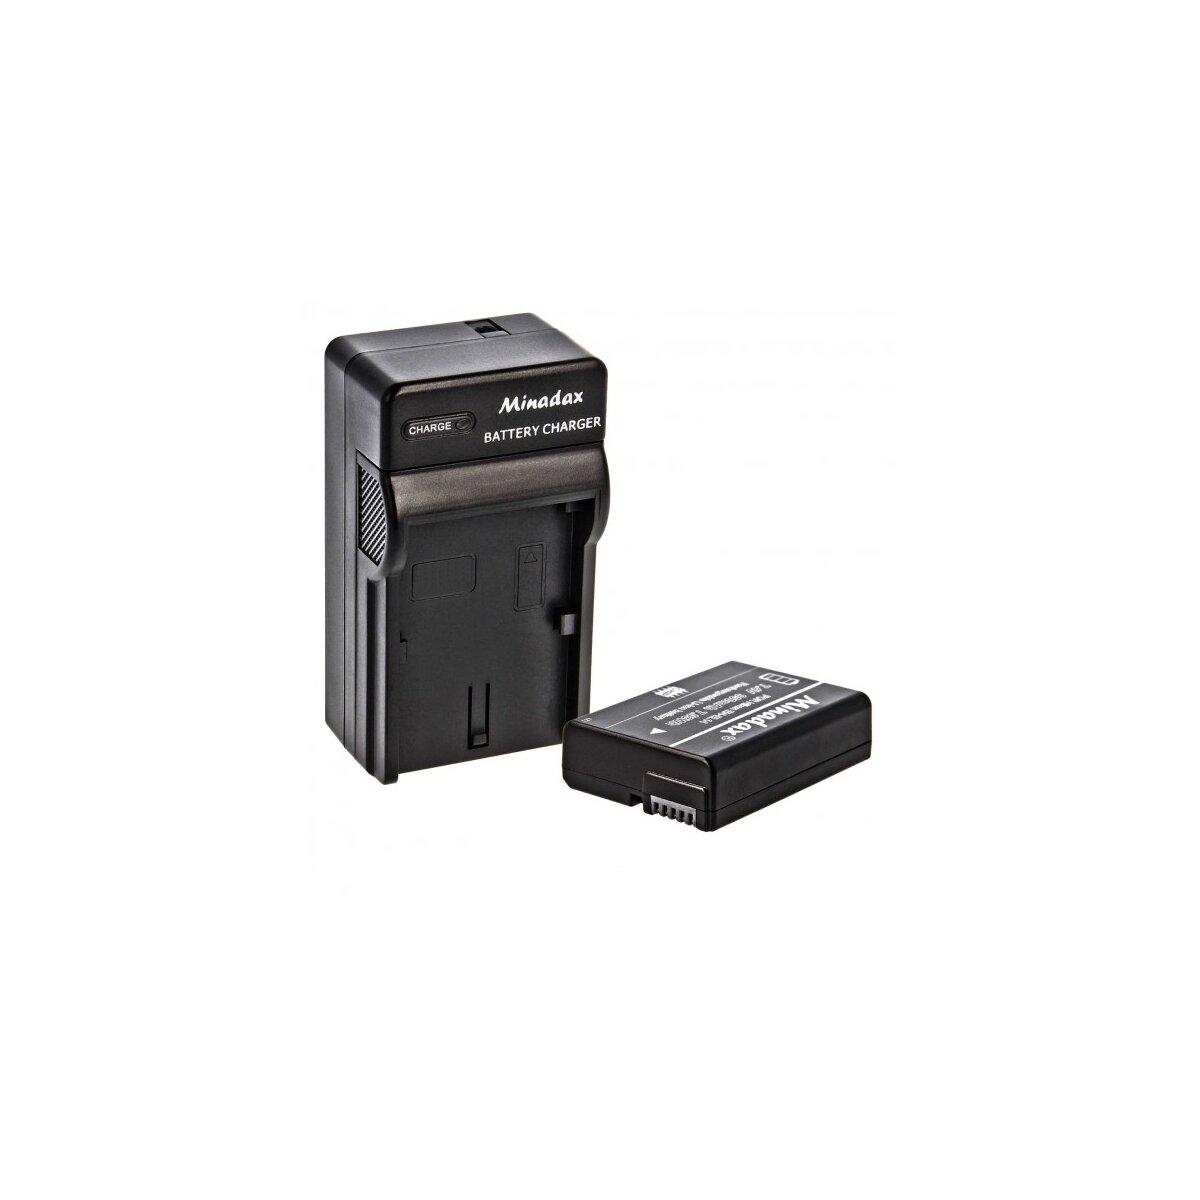 Minadax® Akku + Ladegerät kompatibel mit Nikon EN-EL14 EN-EL14A inkl. Auto Ladekabel, Ladeschale austauschbar + Ersatz für EN-EL14A